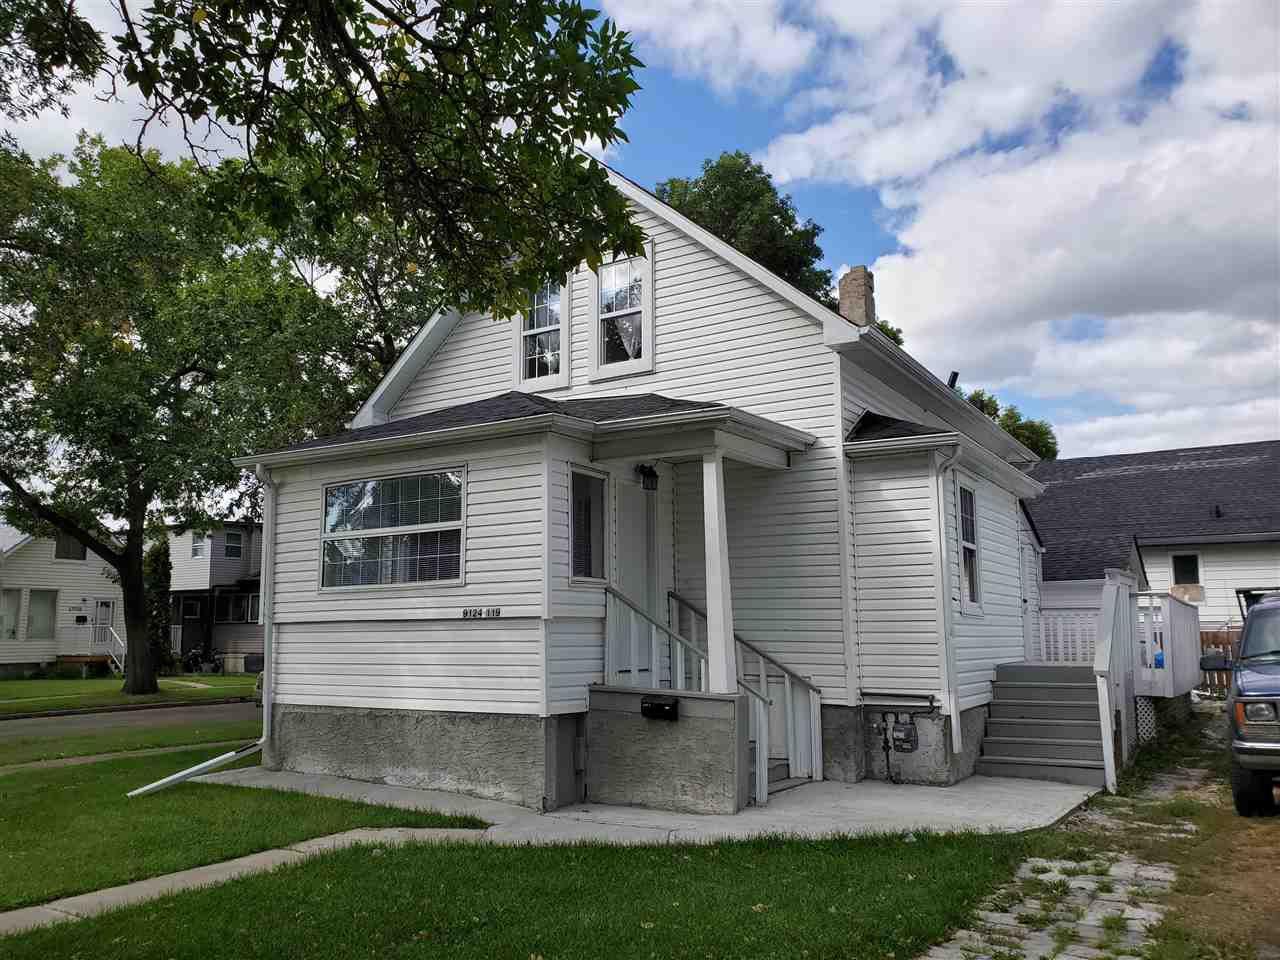 Main Photo: 9124 119 Avenue in Edmonton: Zone 05 House for sale : MLS®# E4171555